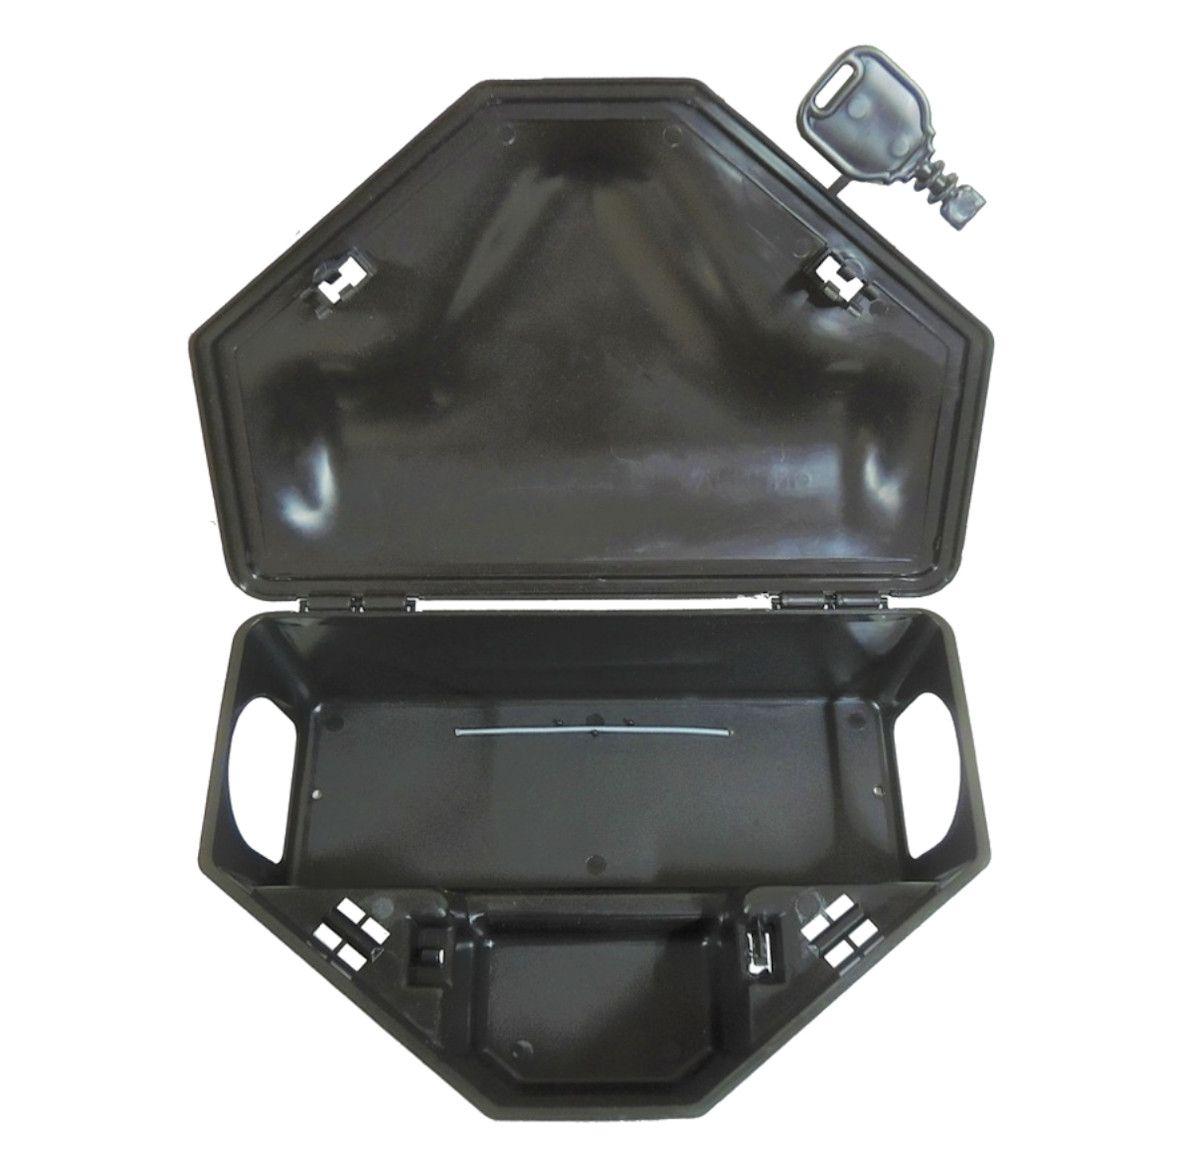 Kit 31 Porta Isca Com 2 Chaves - Duplo Travamento